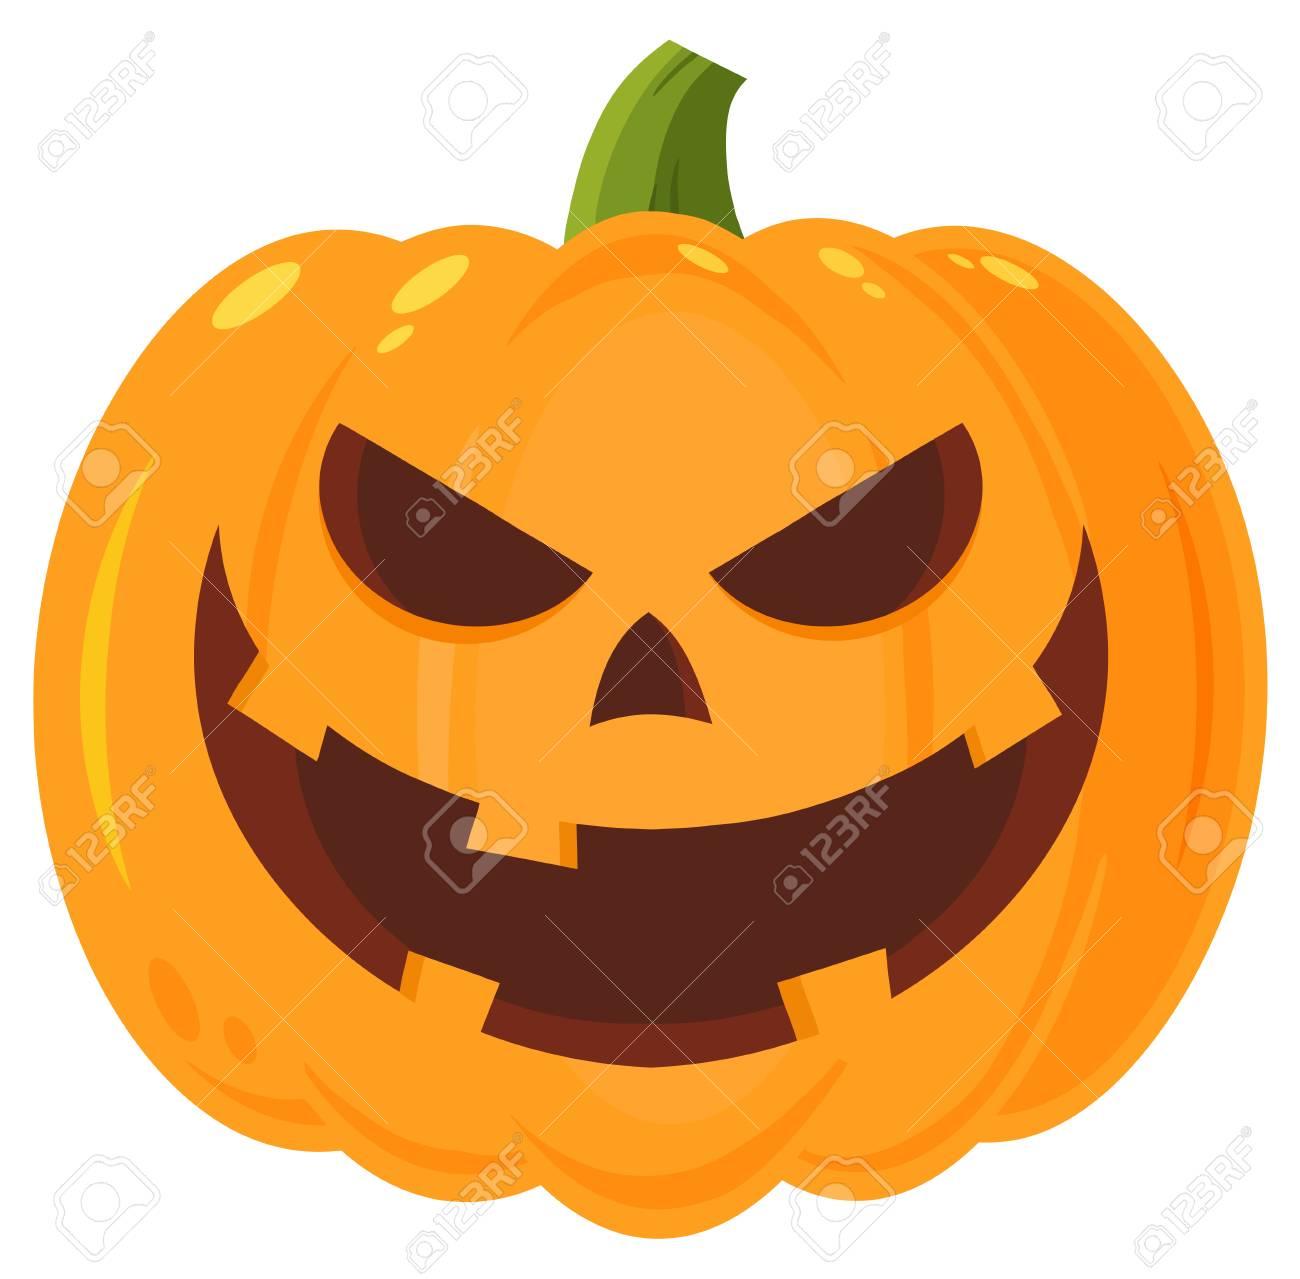 grinning evil halloween pumpkin cartoon emoji face character stock